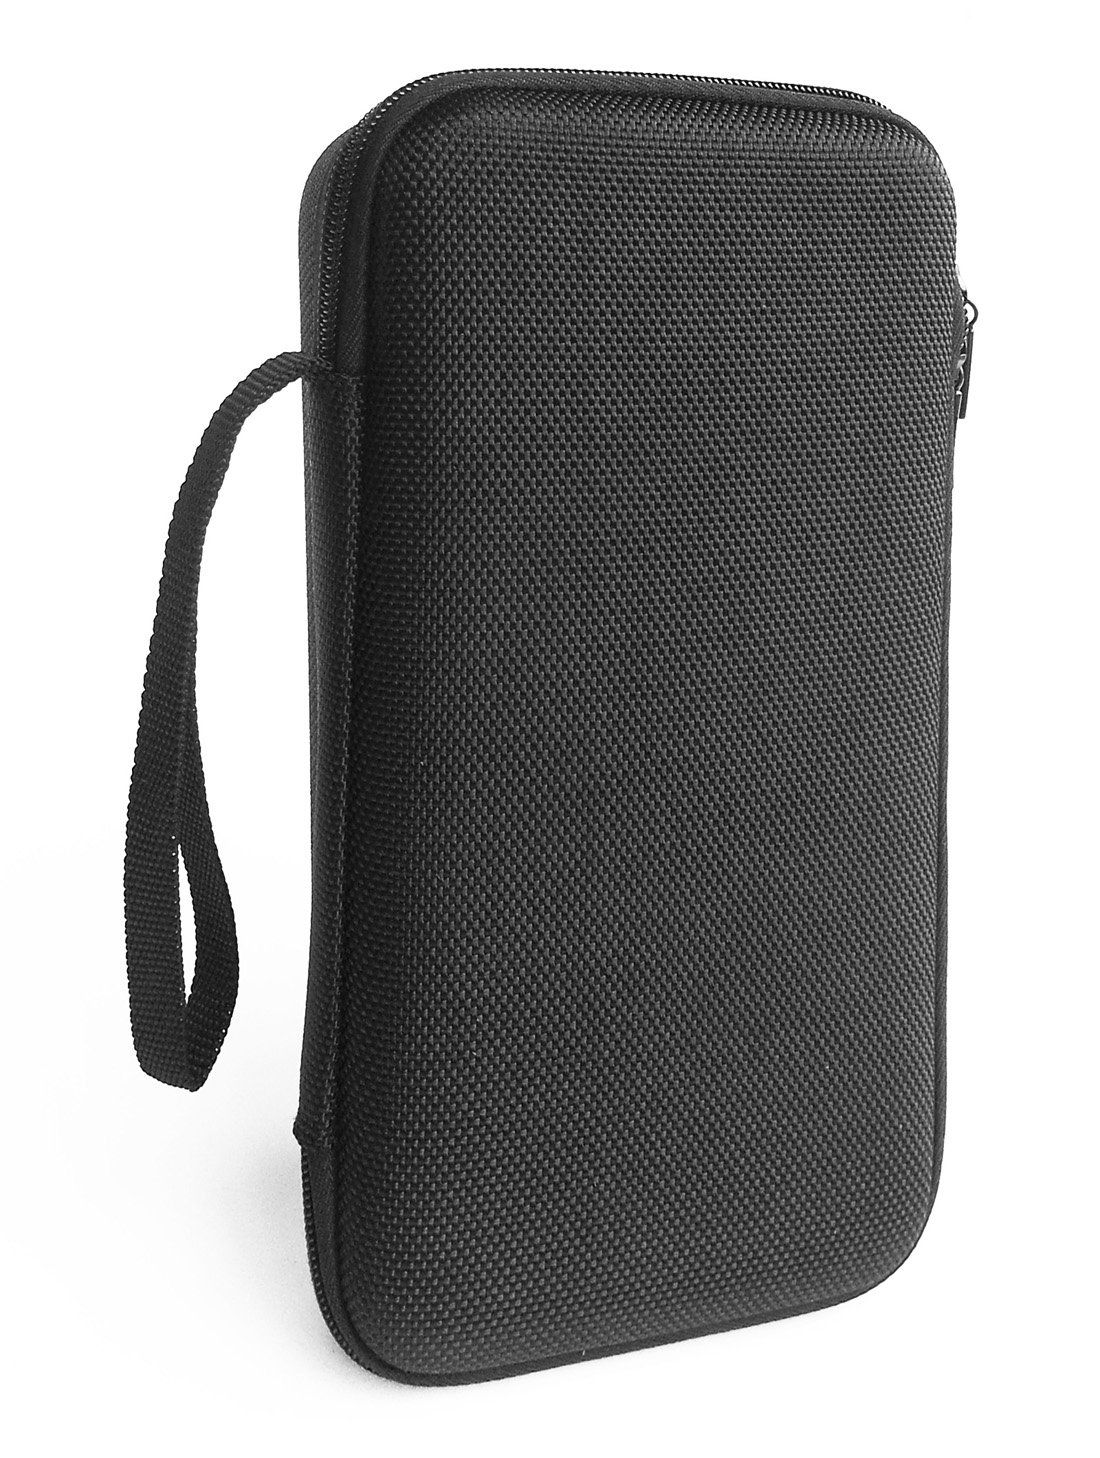 Amazon com innova 3320 auto ranging digital multimeter automotive - Amazon Com Fitsand Tm Travel Zipper Portable Carry Protective Hard Case Cover Box For Innova 3320 Auto Ranging Digital Multimeter Home Audio Theater